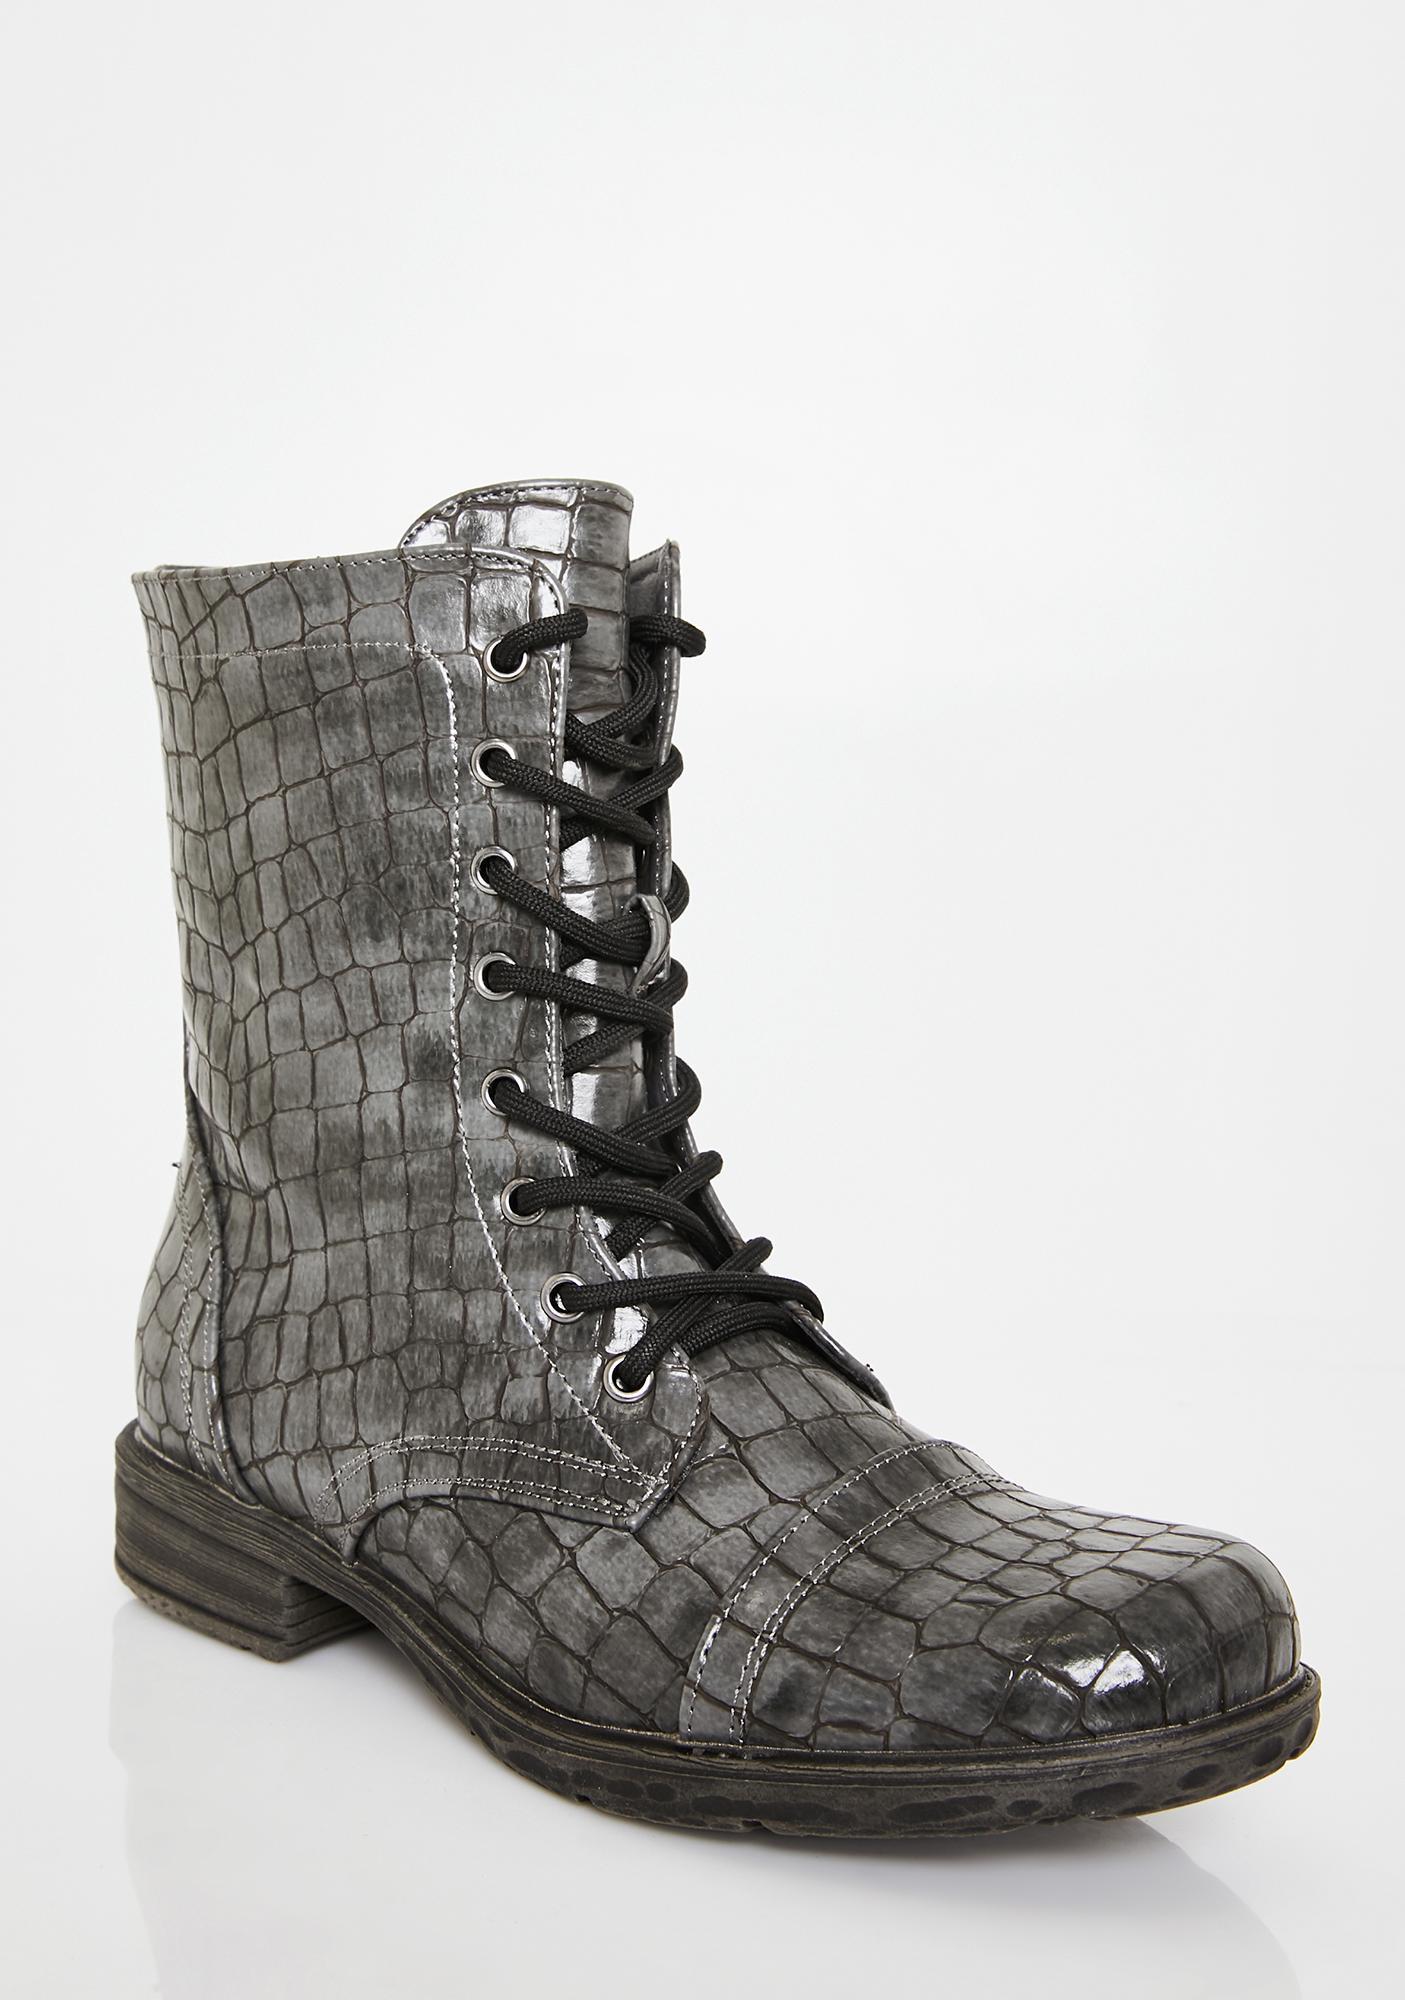 Volatile Shoes Underground Boots